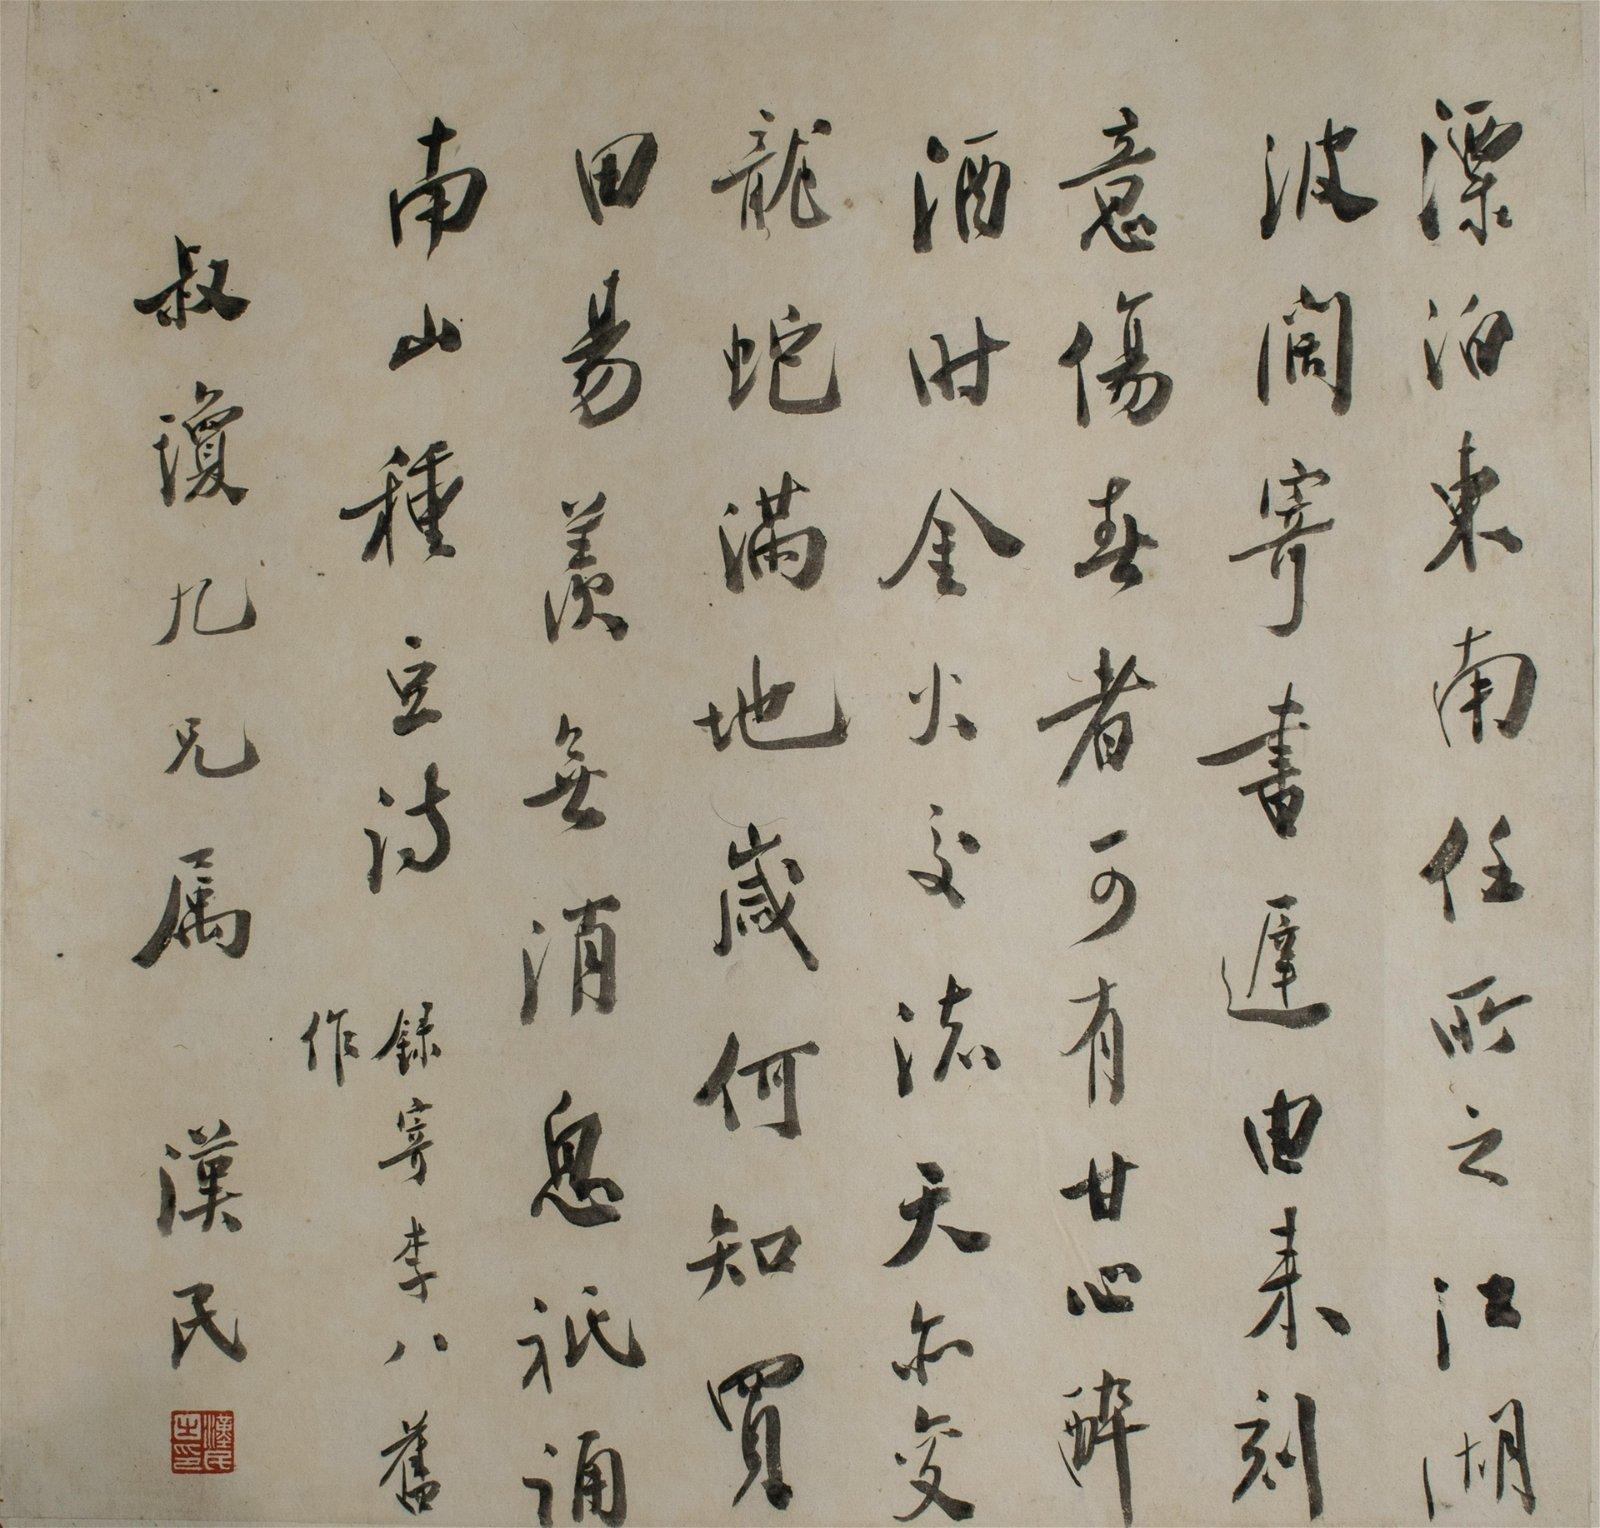 Calligraphy Album, Hu Hanmin Dedicated to Shuqiong